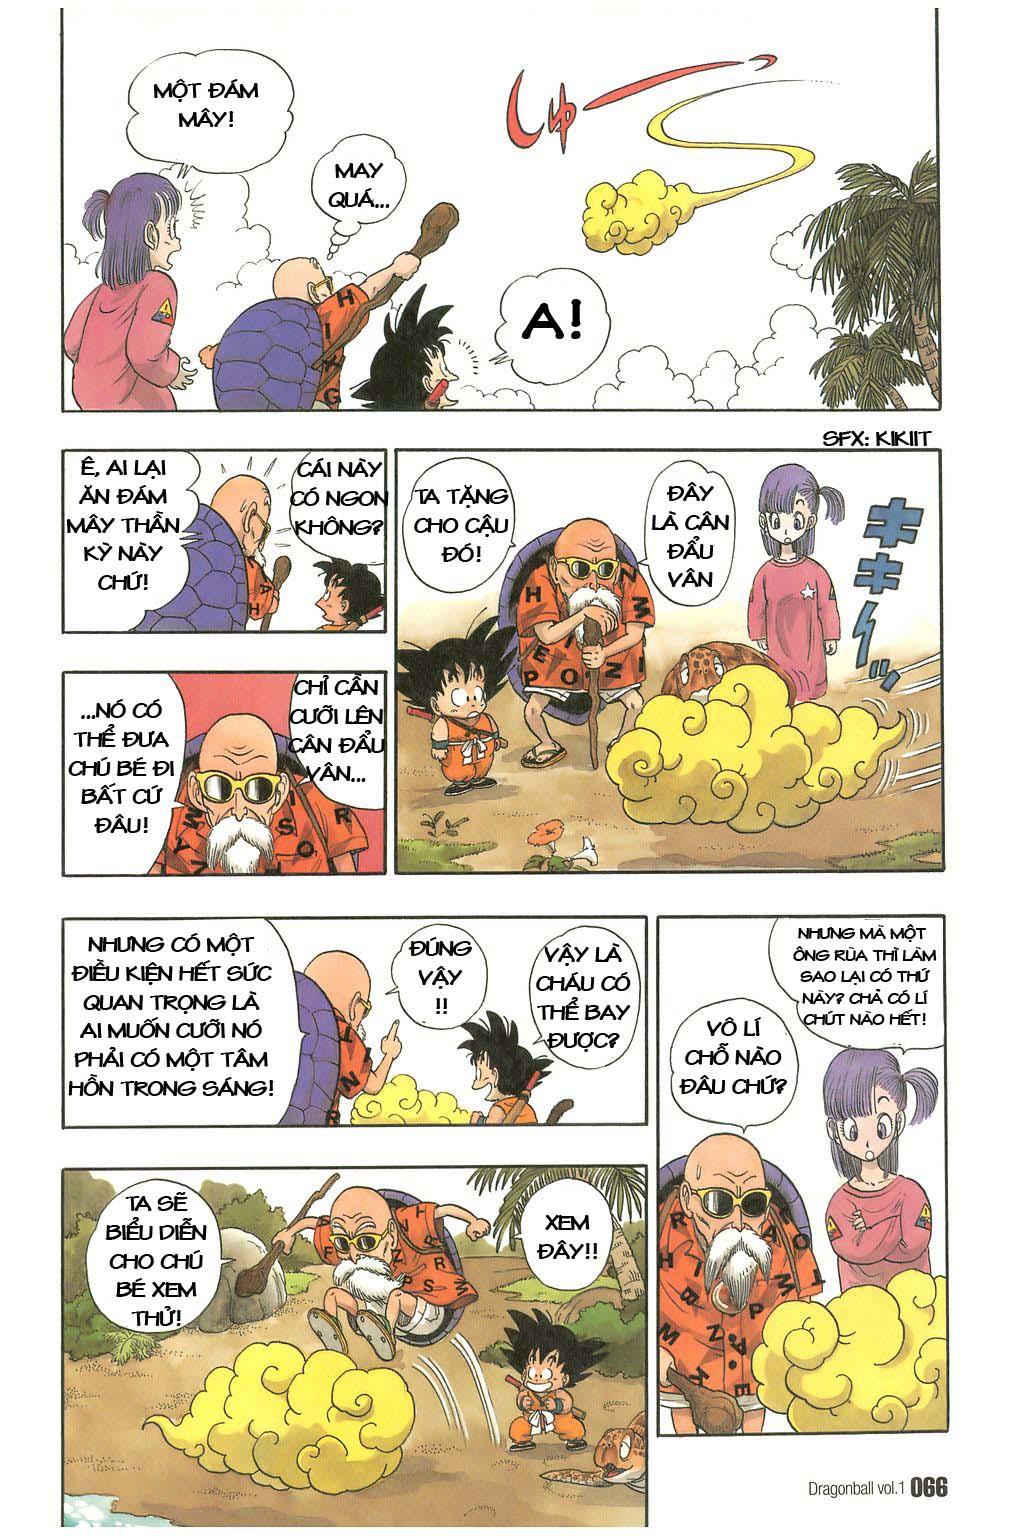 7 Viên Ngọc Rồng - Dragon Ball chap 4 Kintoun của Kamesenin | Truyện tranh  online | truyen tranh hay | đọc truyện tranh hay | truyện đẹp | truyện hot